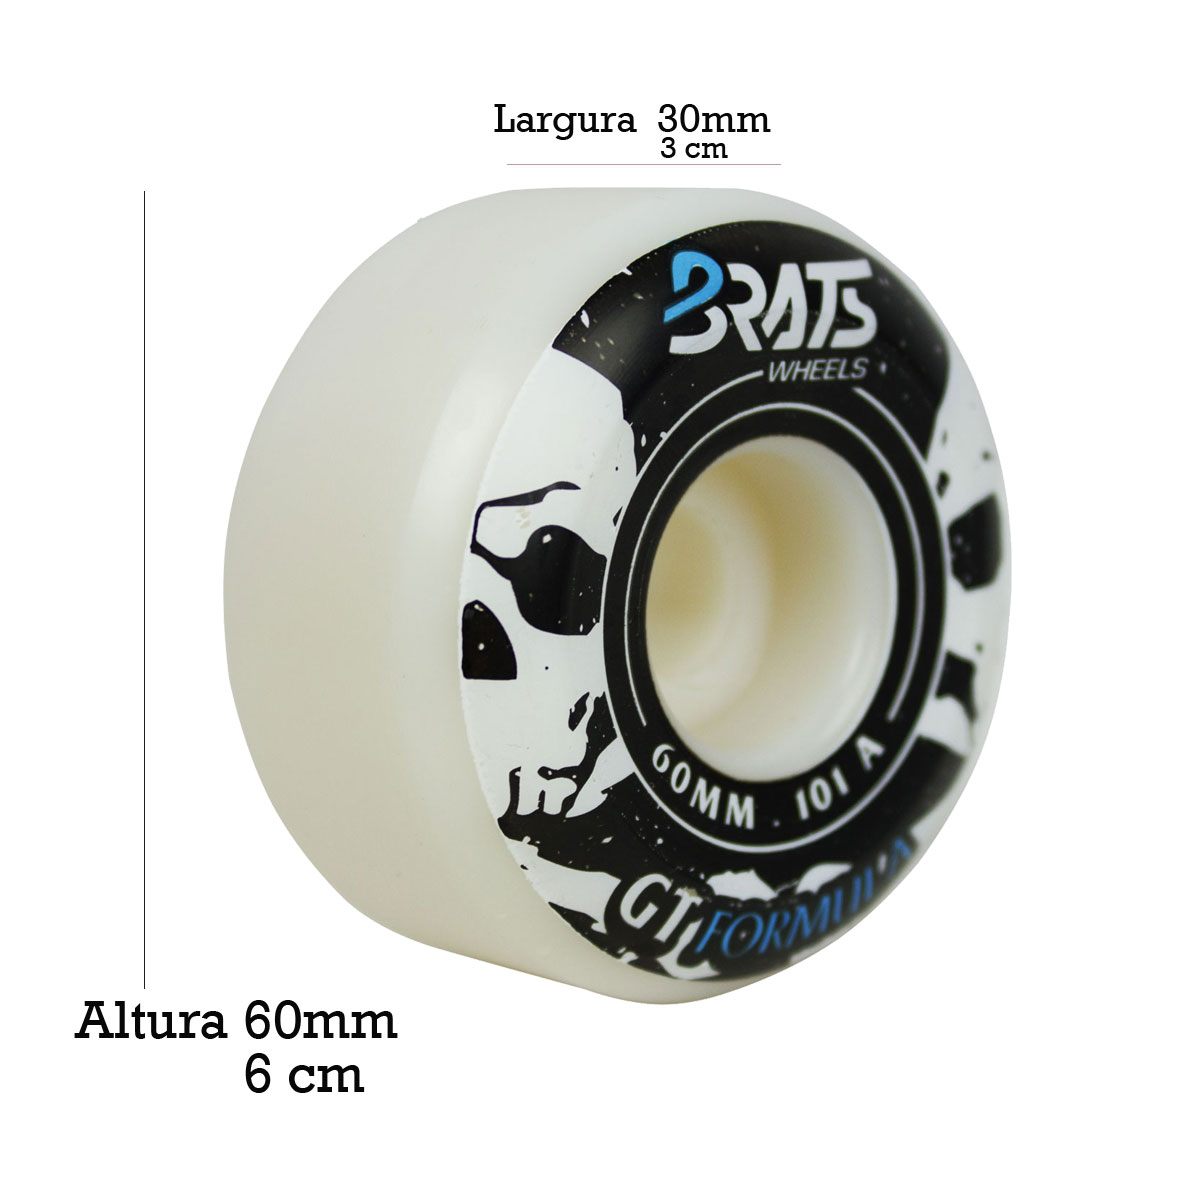 Roda Skate Brats Pro 101A 60mm